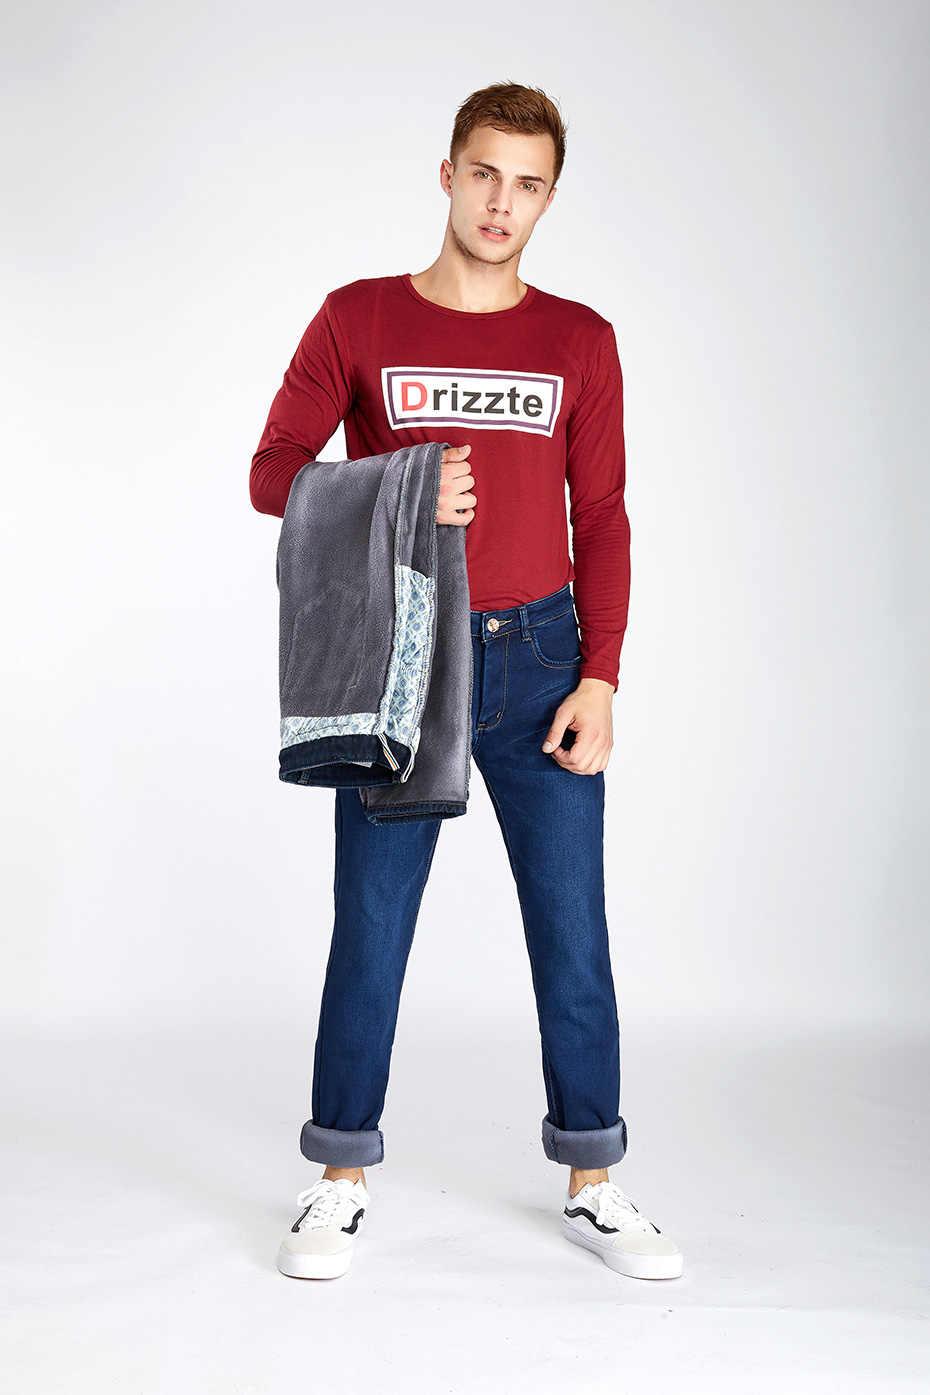 7efb7fcc843 ... Drizzte Mens Winter Fleece Jeans Flannel Lined Stretch Denim Jeans Slim  Fit Trousers Pants 33 34